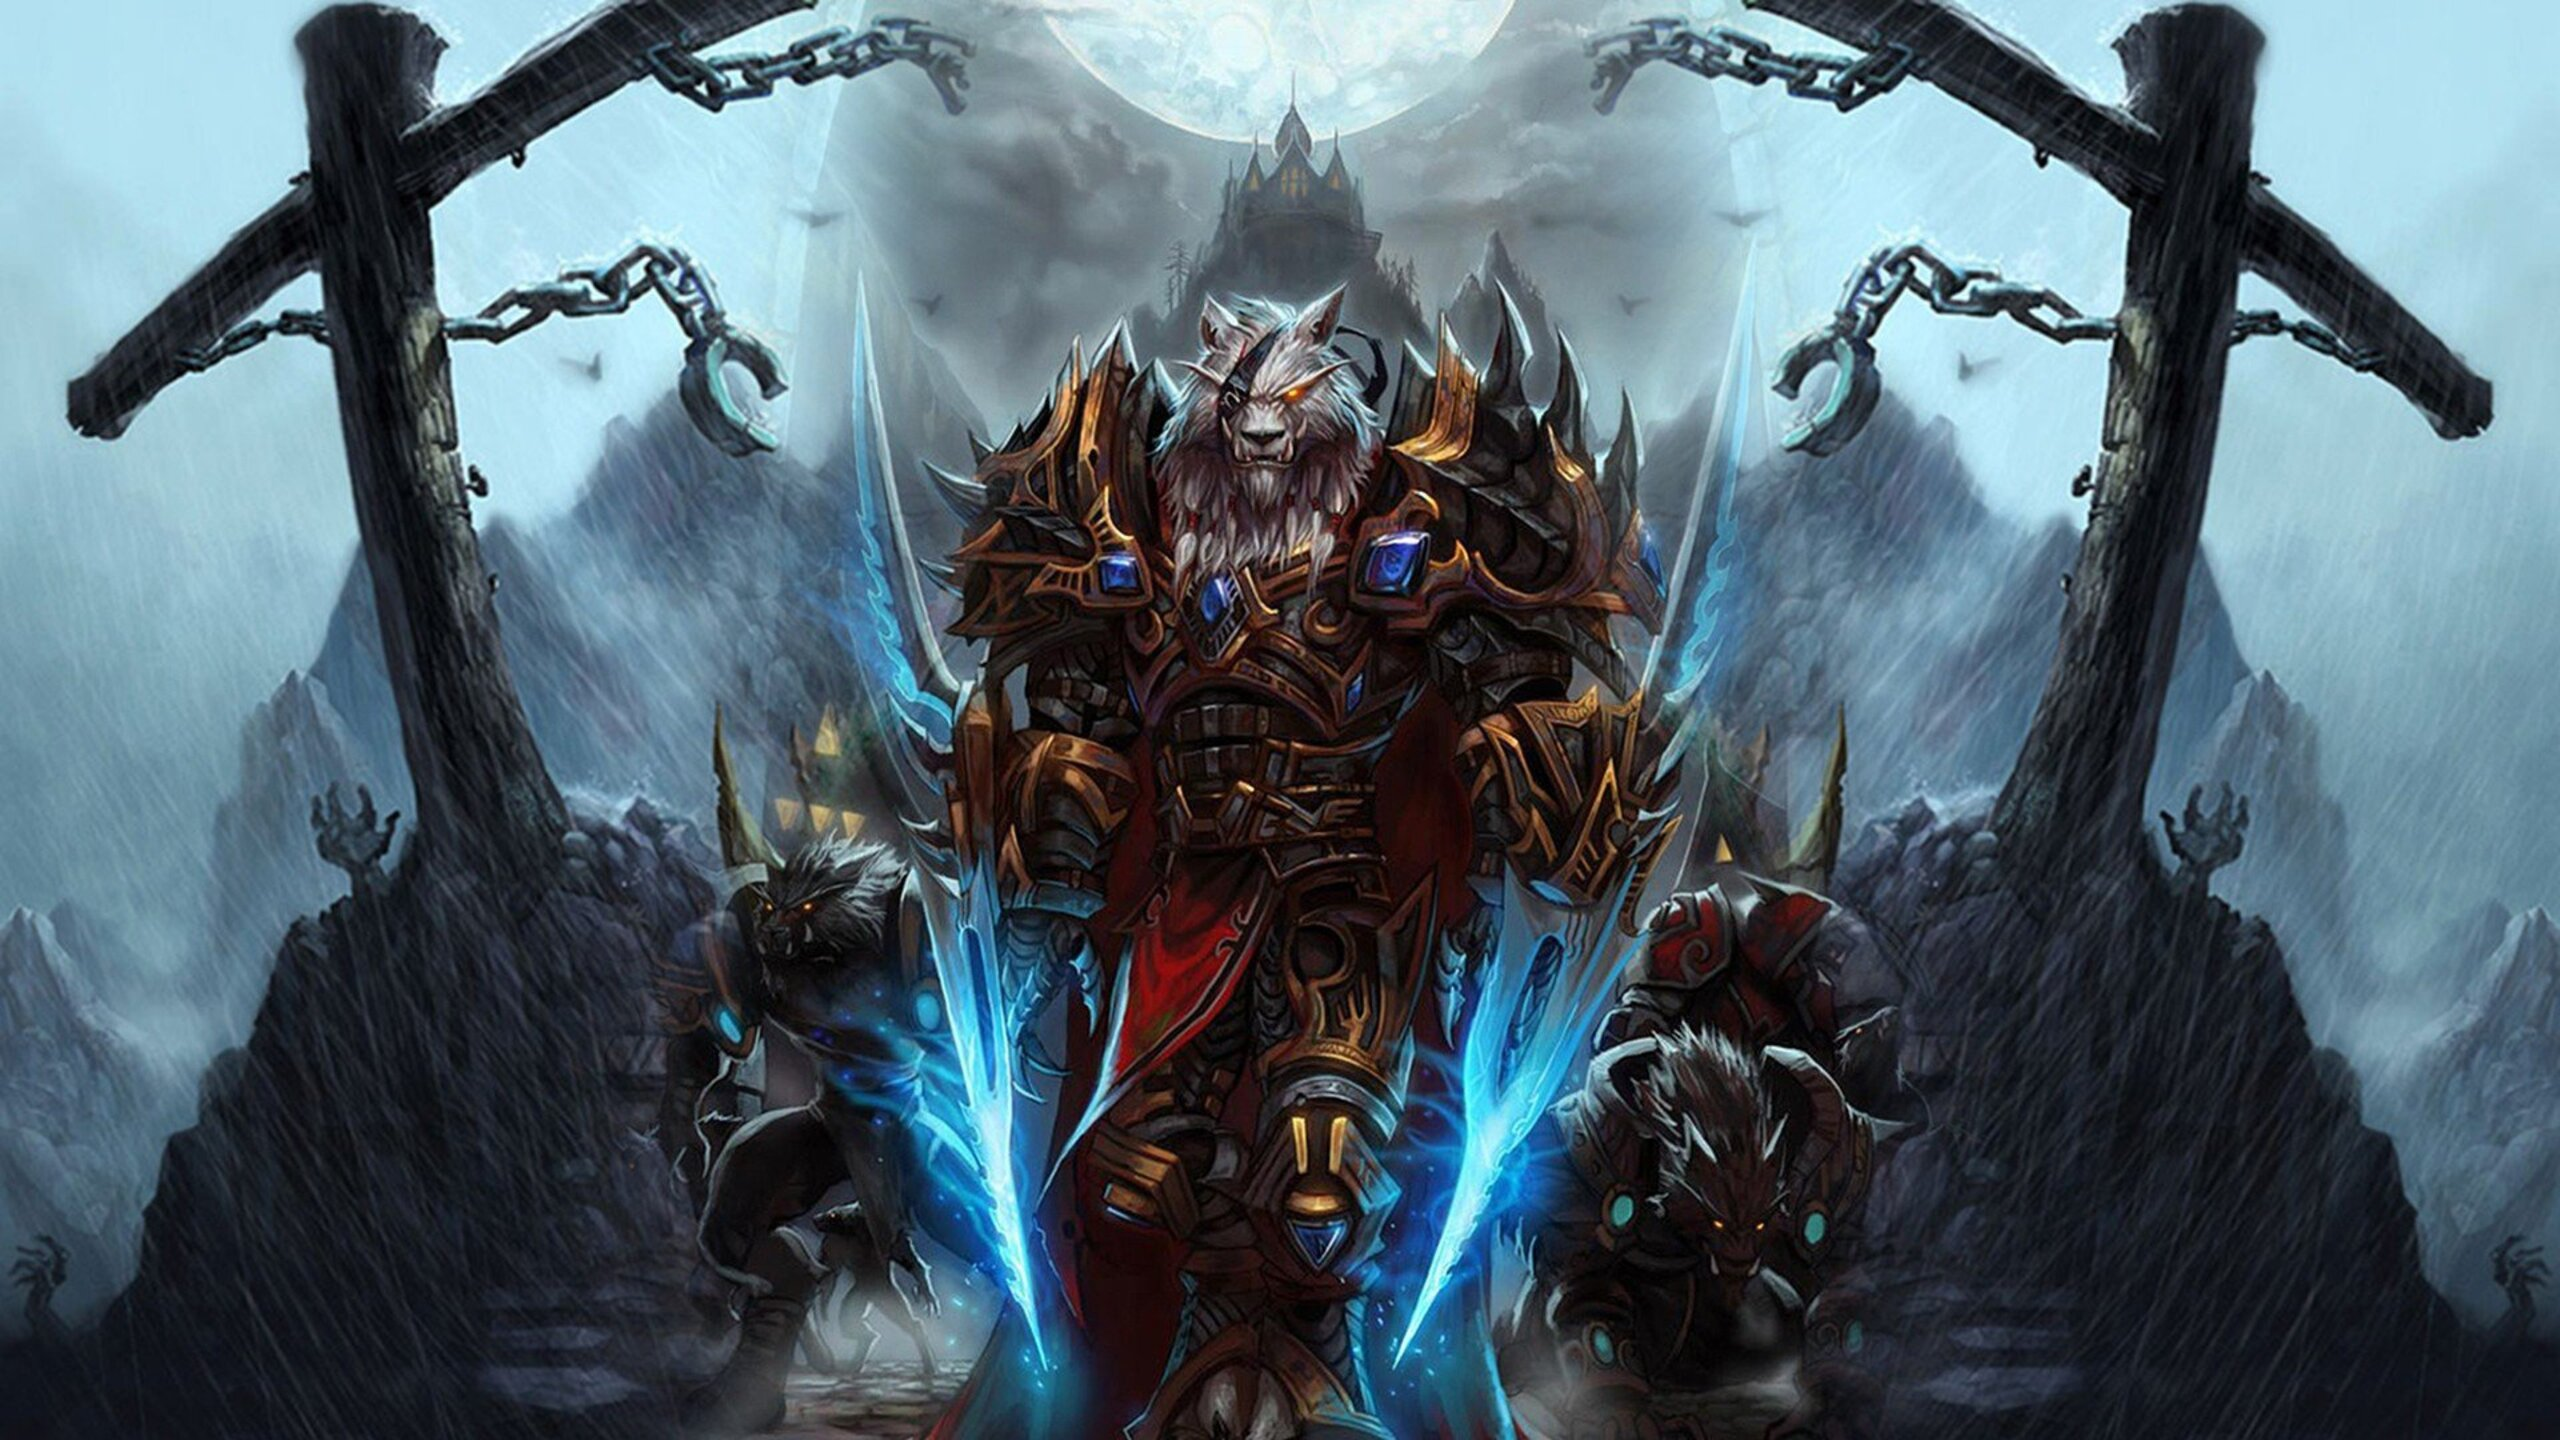 World Of Warcraft 4k Wallpaper: 2560x1440 World Of Warcraft Worgen Character 1440P